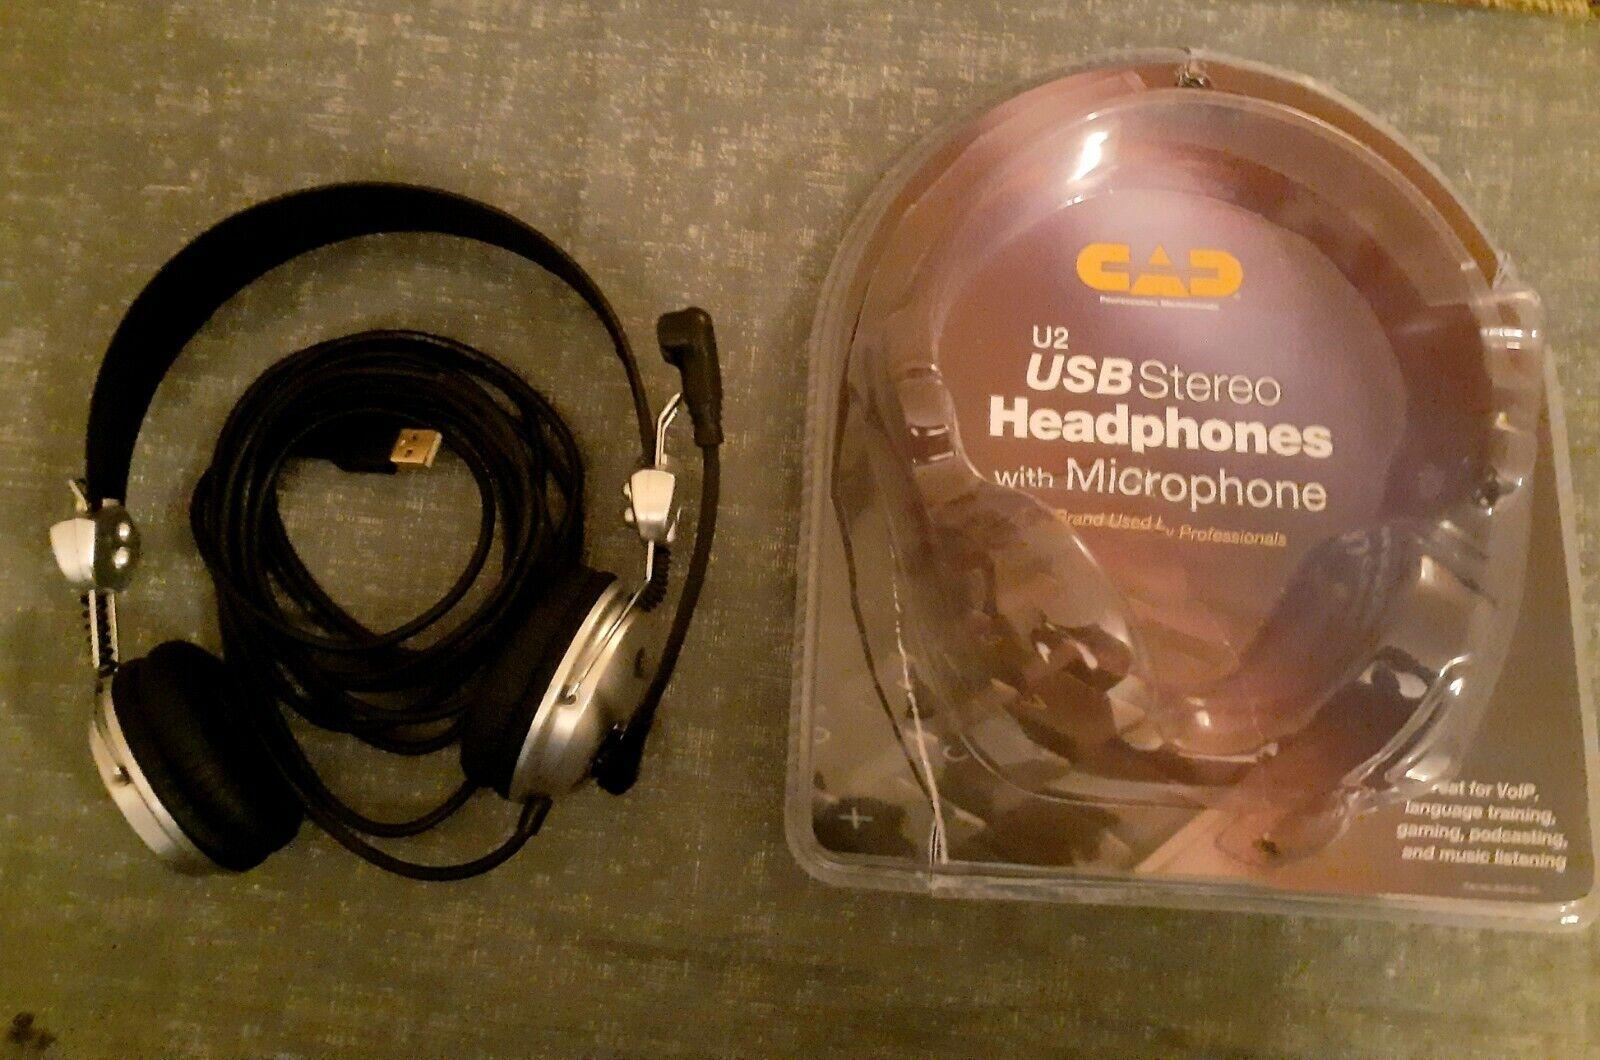 CAD U2 USB Podcasting/Gaming Headphone W/Mic 85th Anniversary Edition  - $33.00